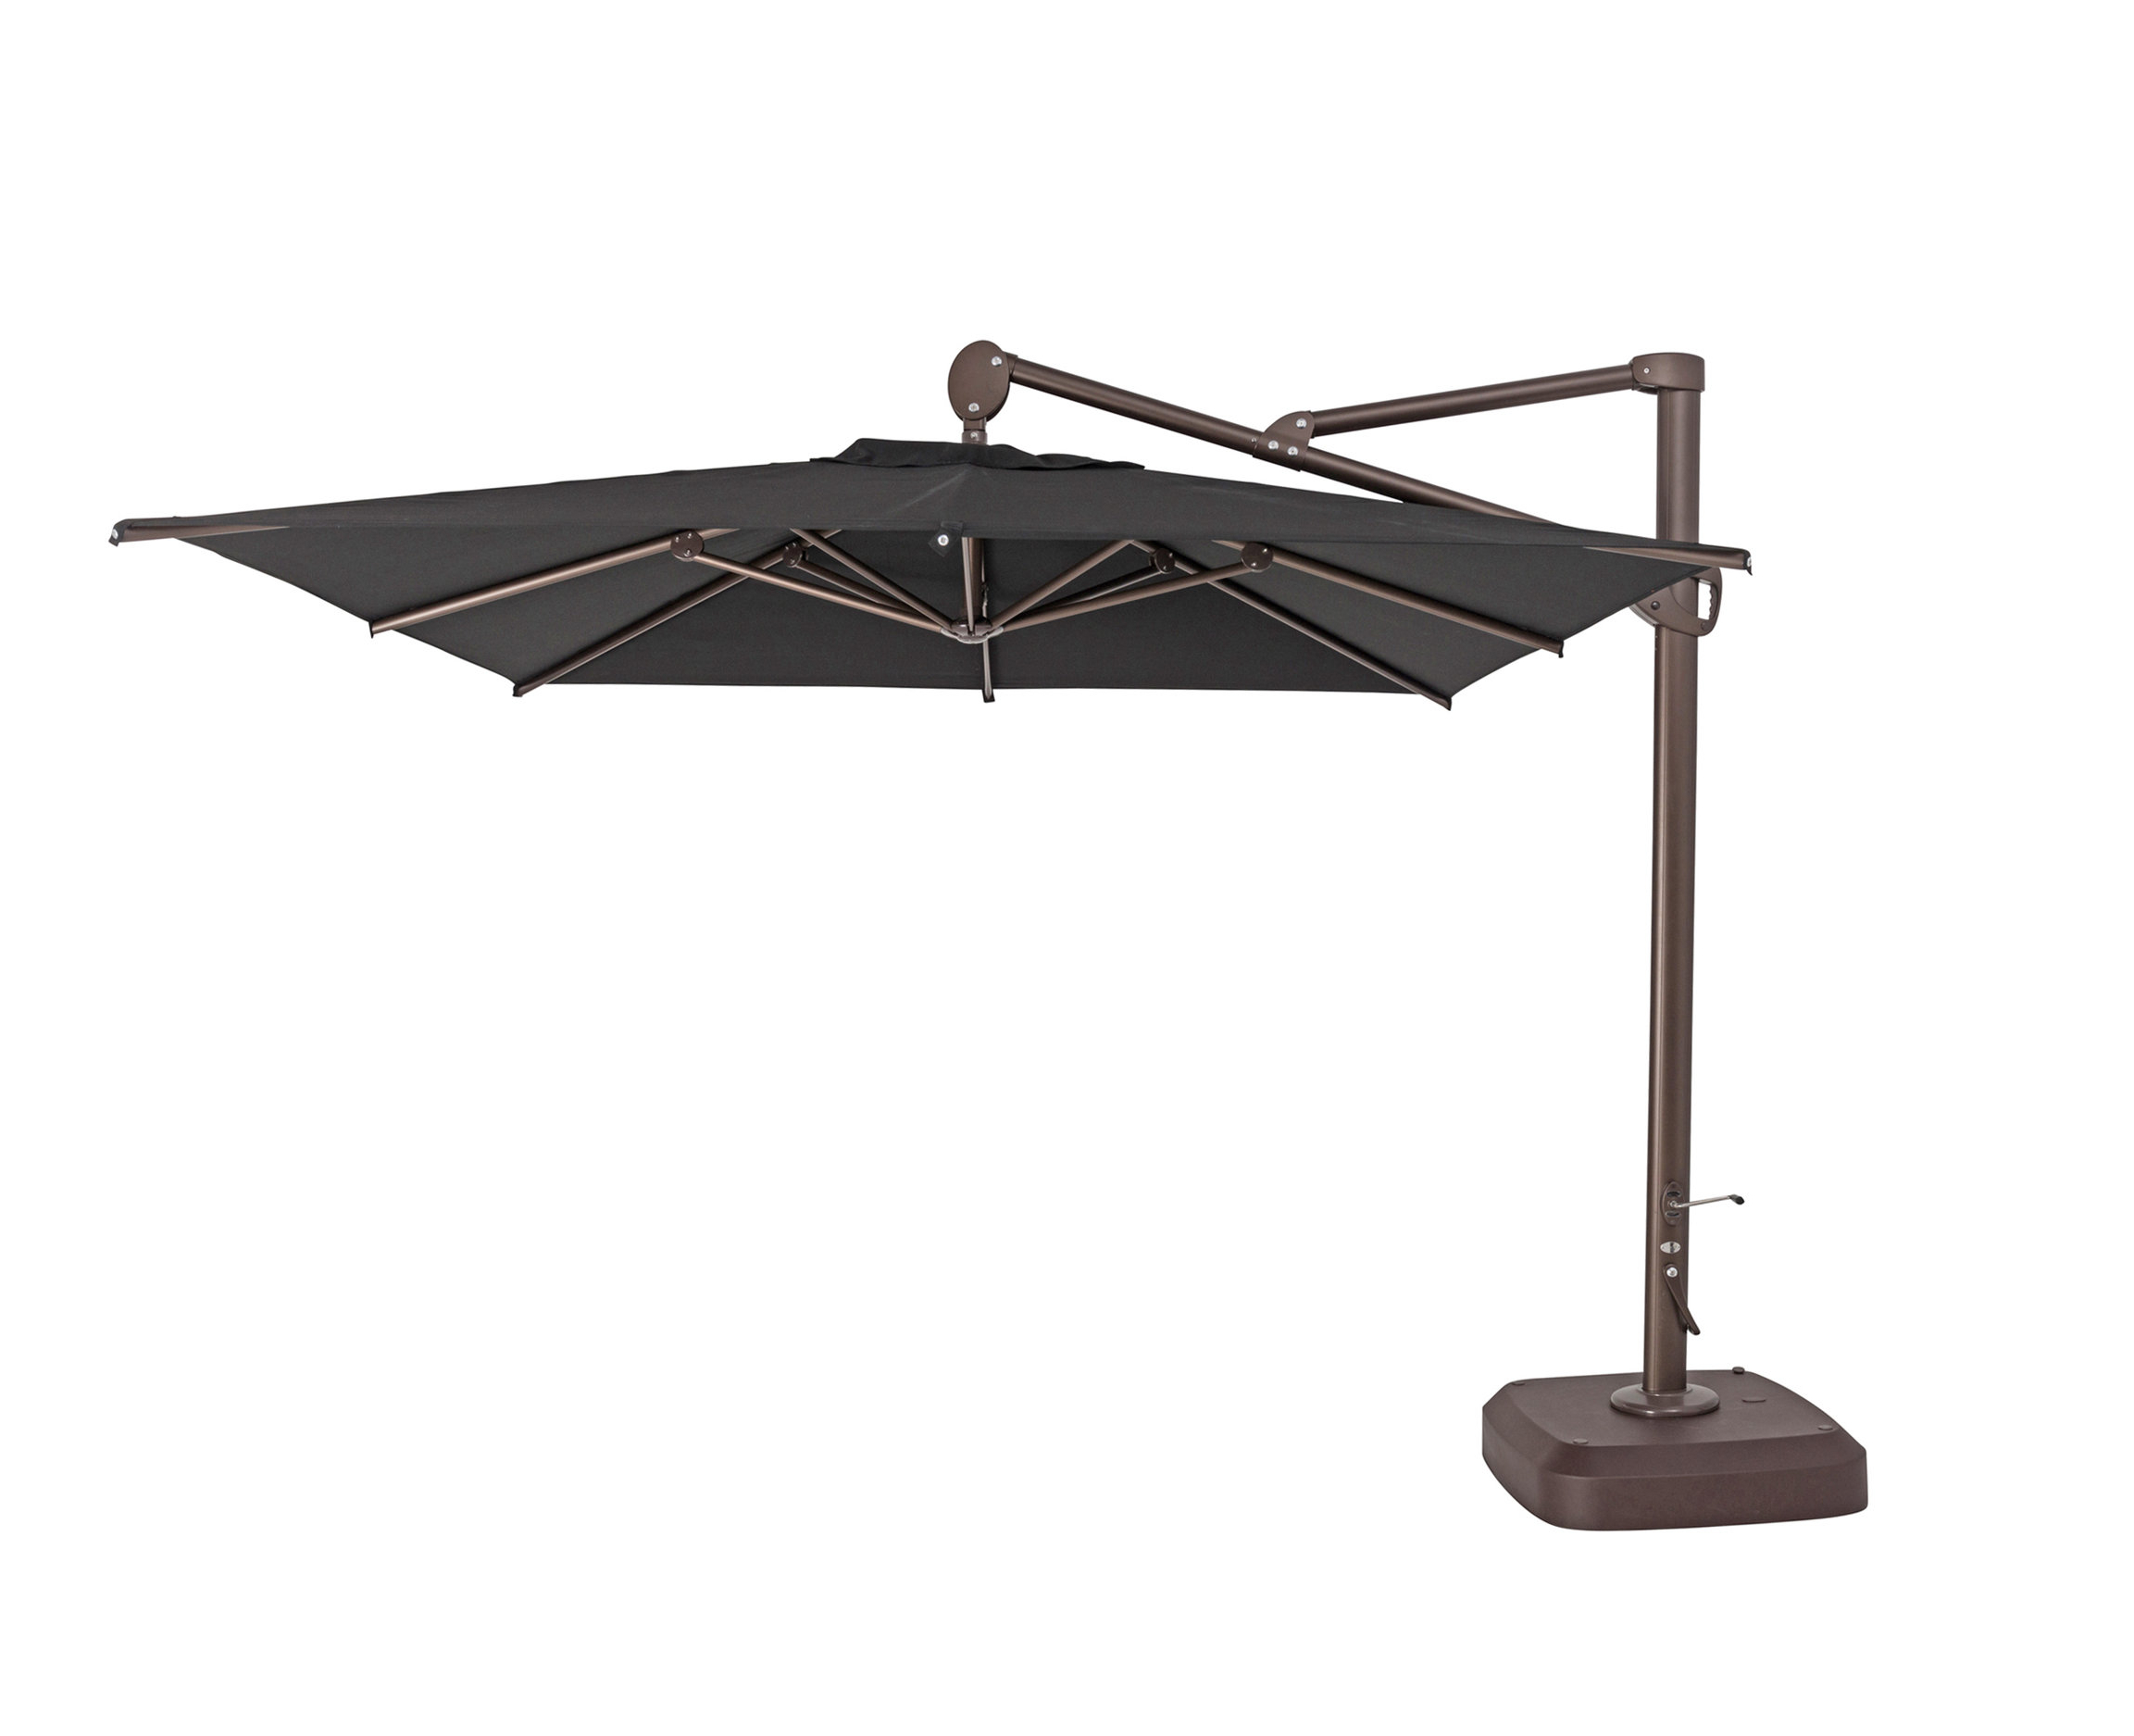 Most Current Olen Cantilever Umbrellas Regarding 10' Square Cantilever Umbrella (View 4 of 20)